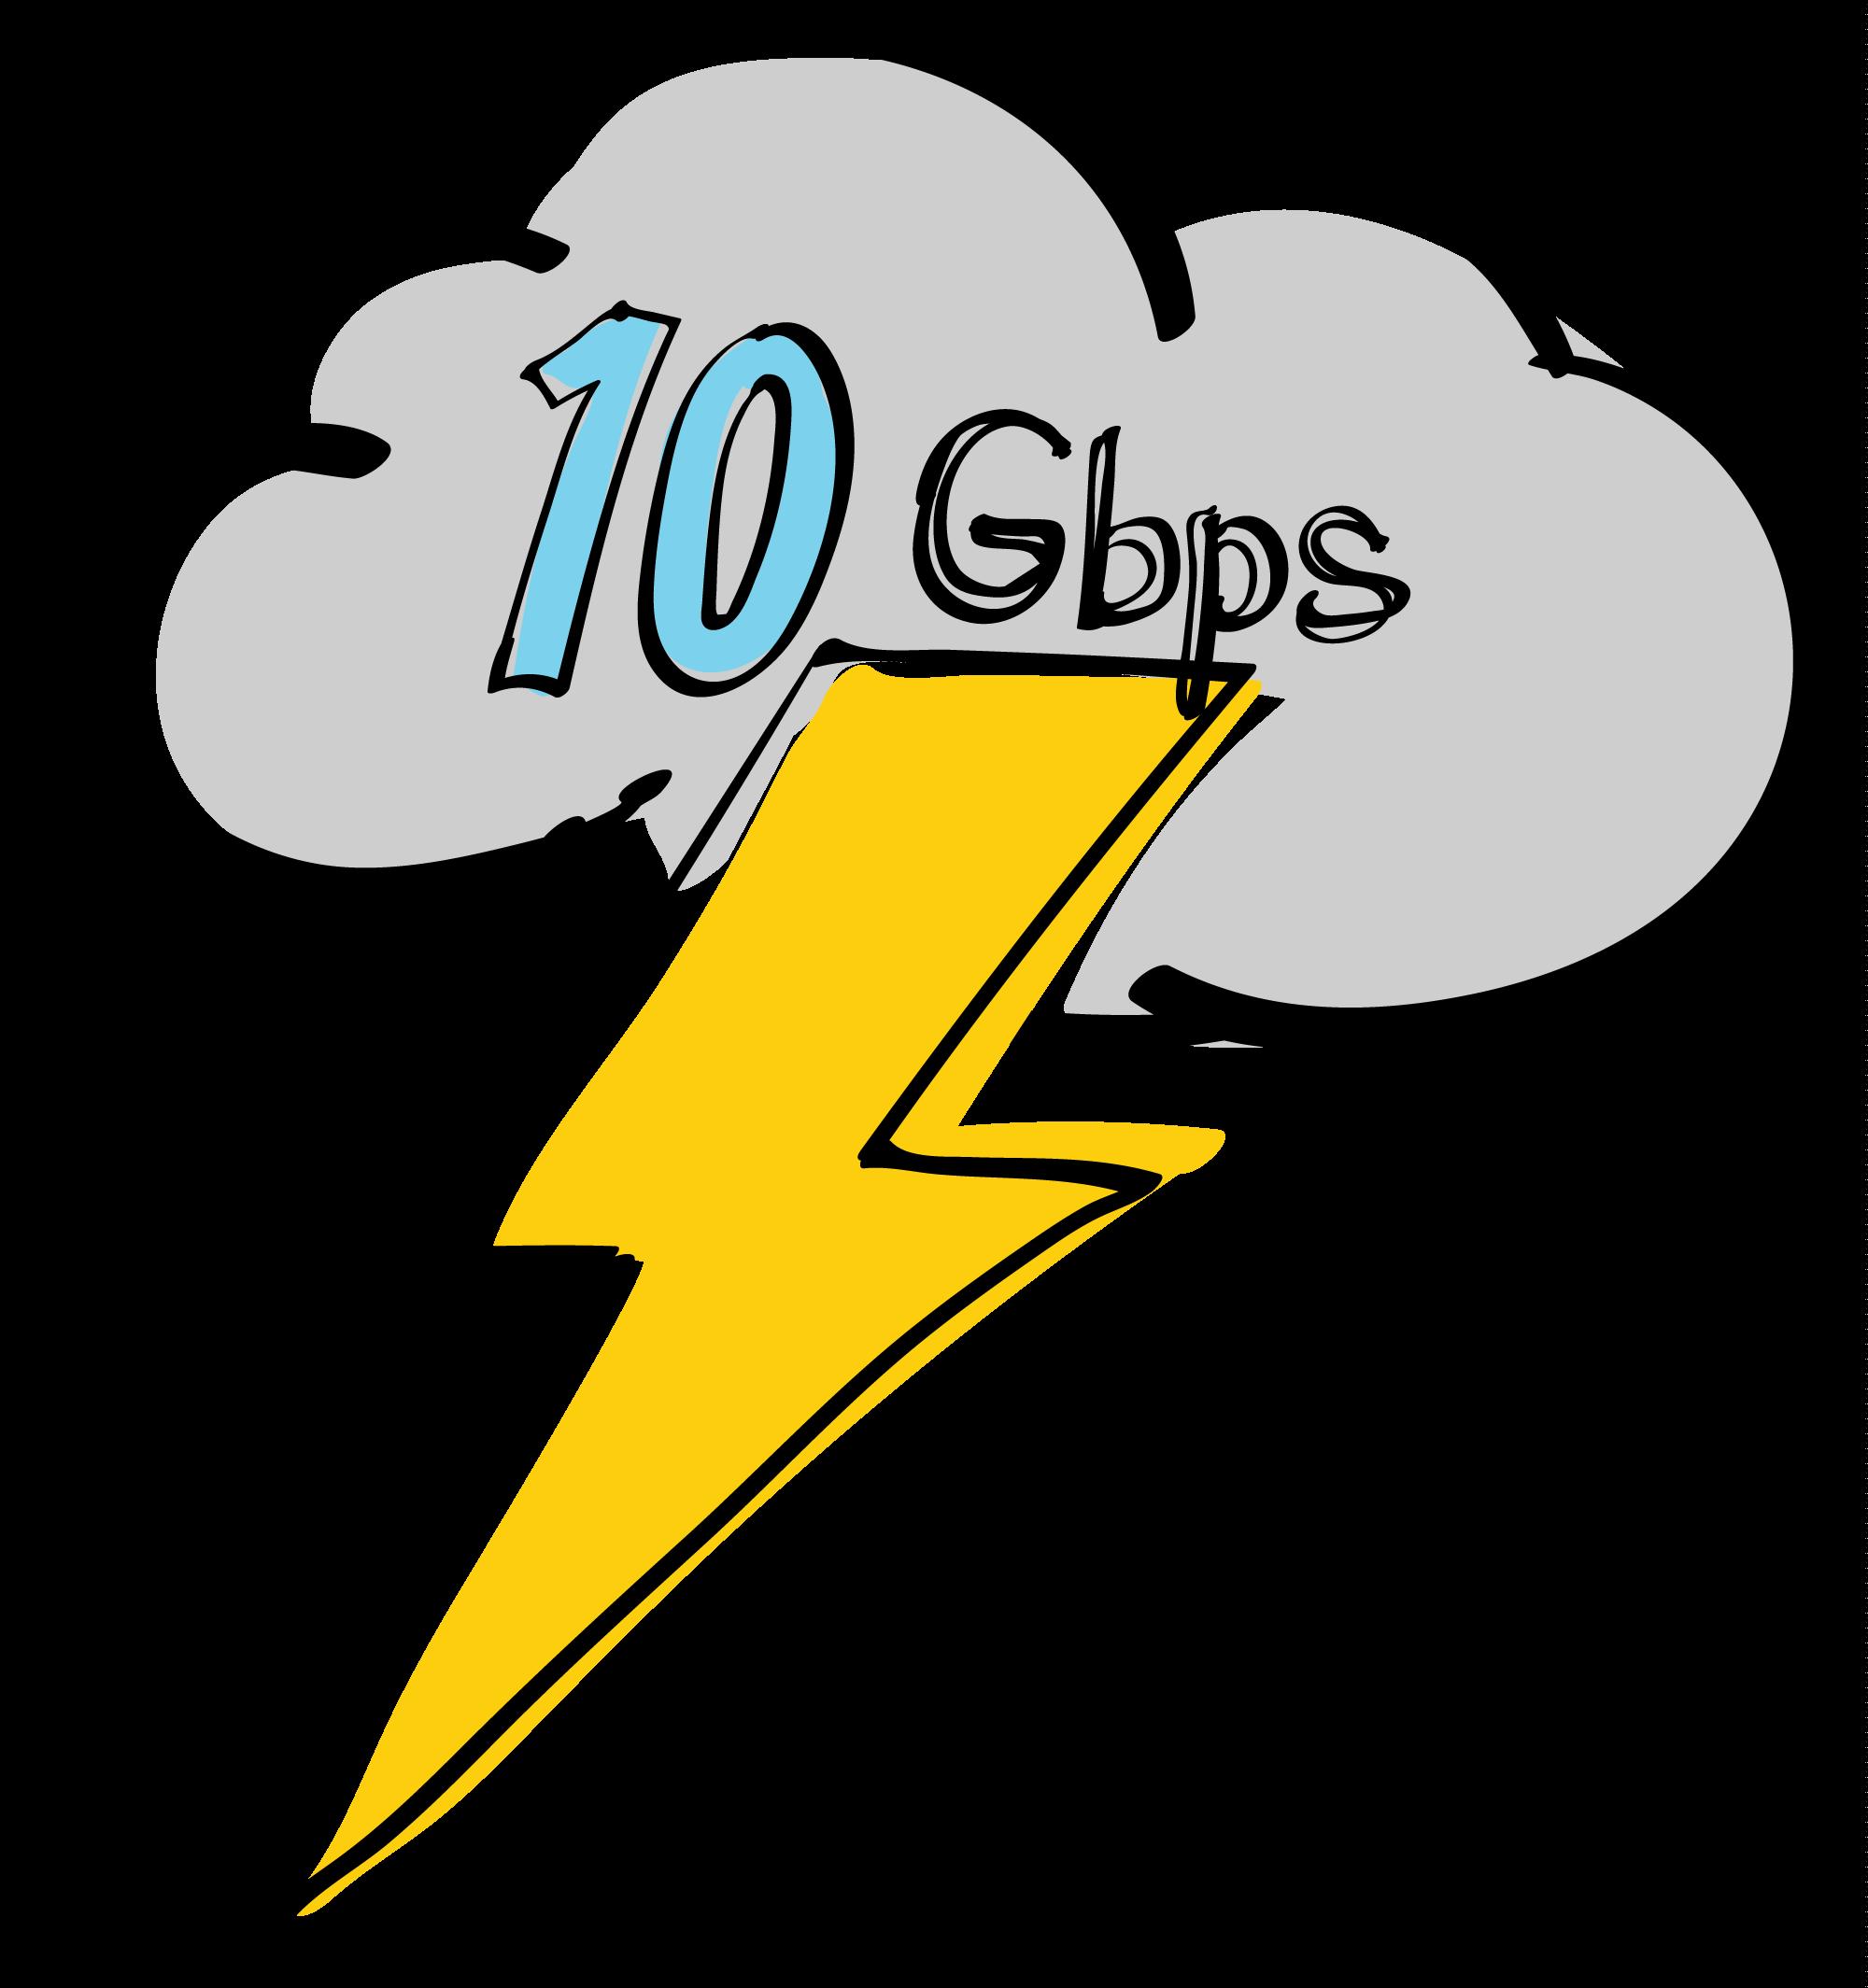 BTNET 10GBPS LEASED LINE ETHERNET